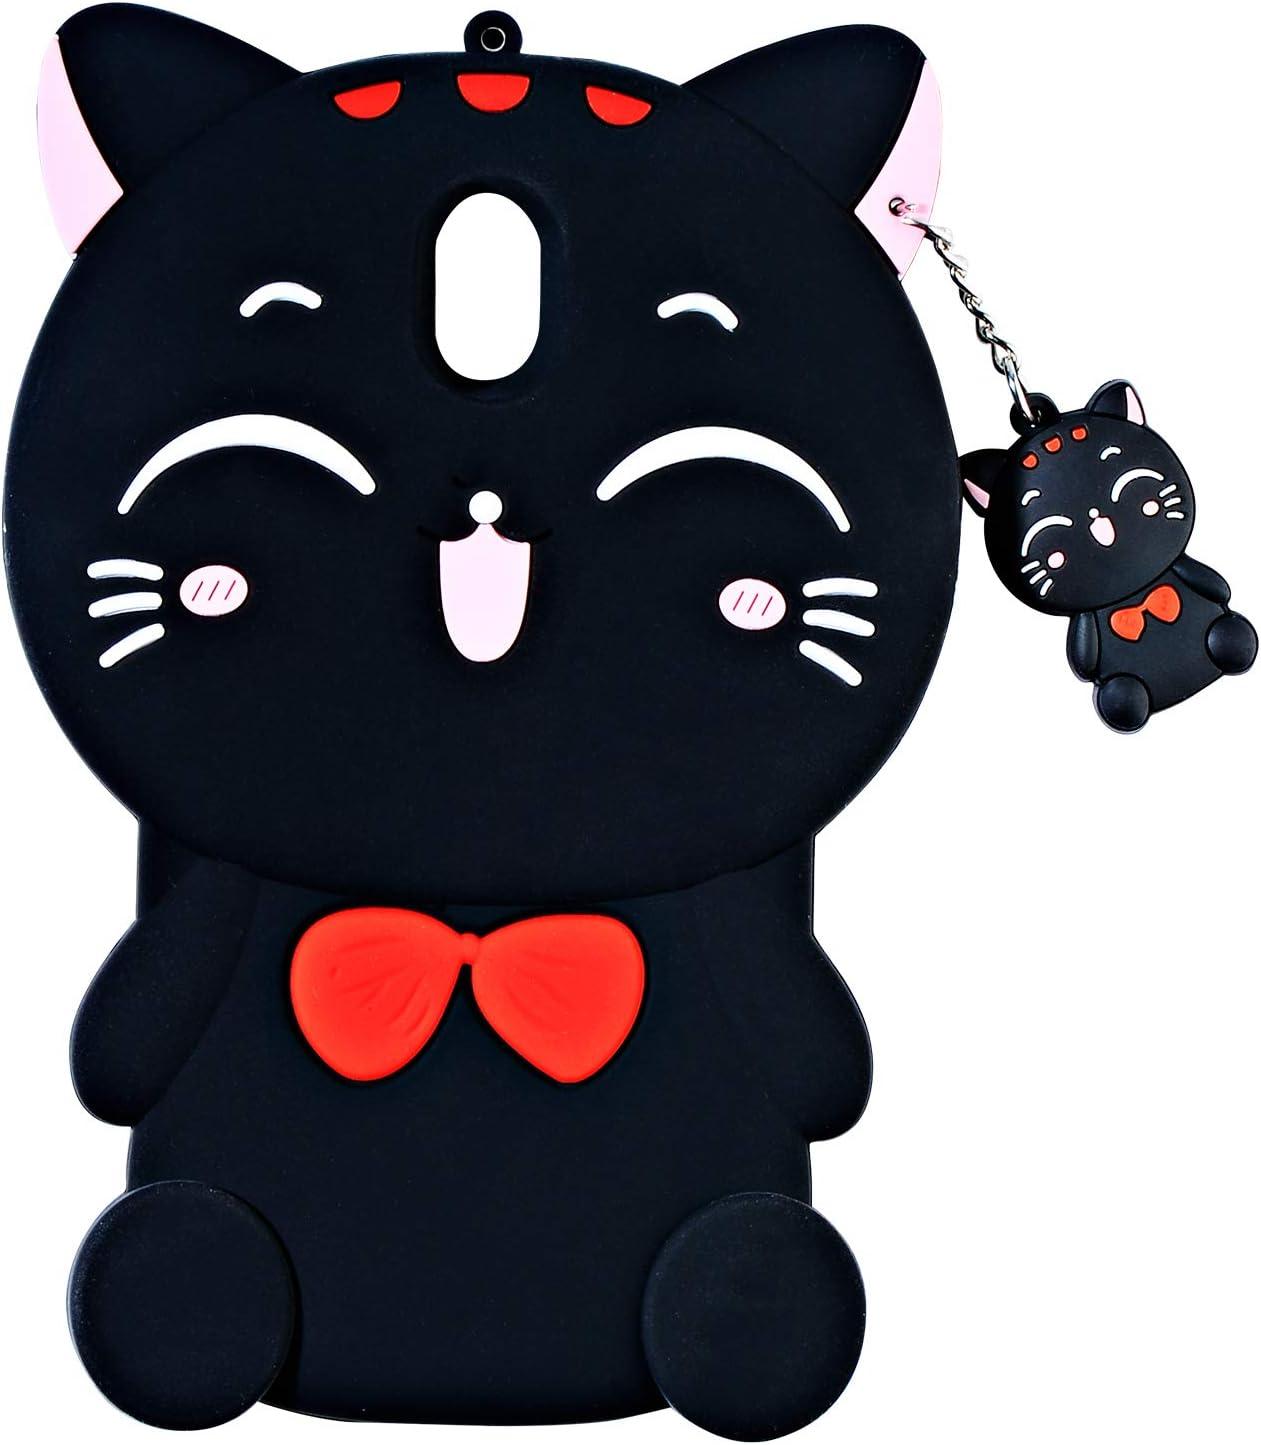 TopSZ Black Lucky Cat Case for Samsung Galaxy J3 Achieve/J3 Star/Express Prime 3,3D Cartoon Silicone Kawaii Animal Cute Girls Kids Teens Cover for Amp Prime 3/Sol 3/J3 Orbit/J3 Emerge 2018 J3 2018